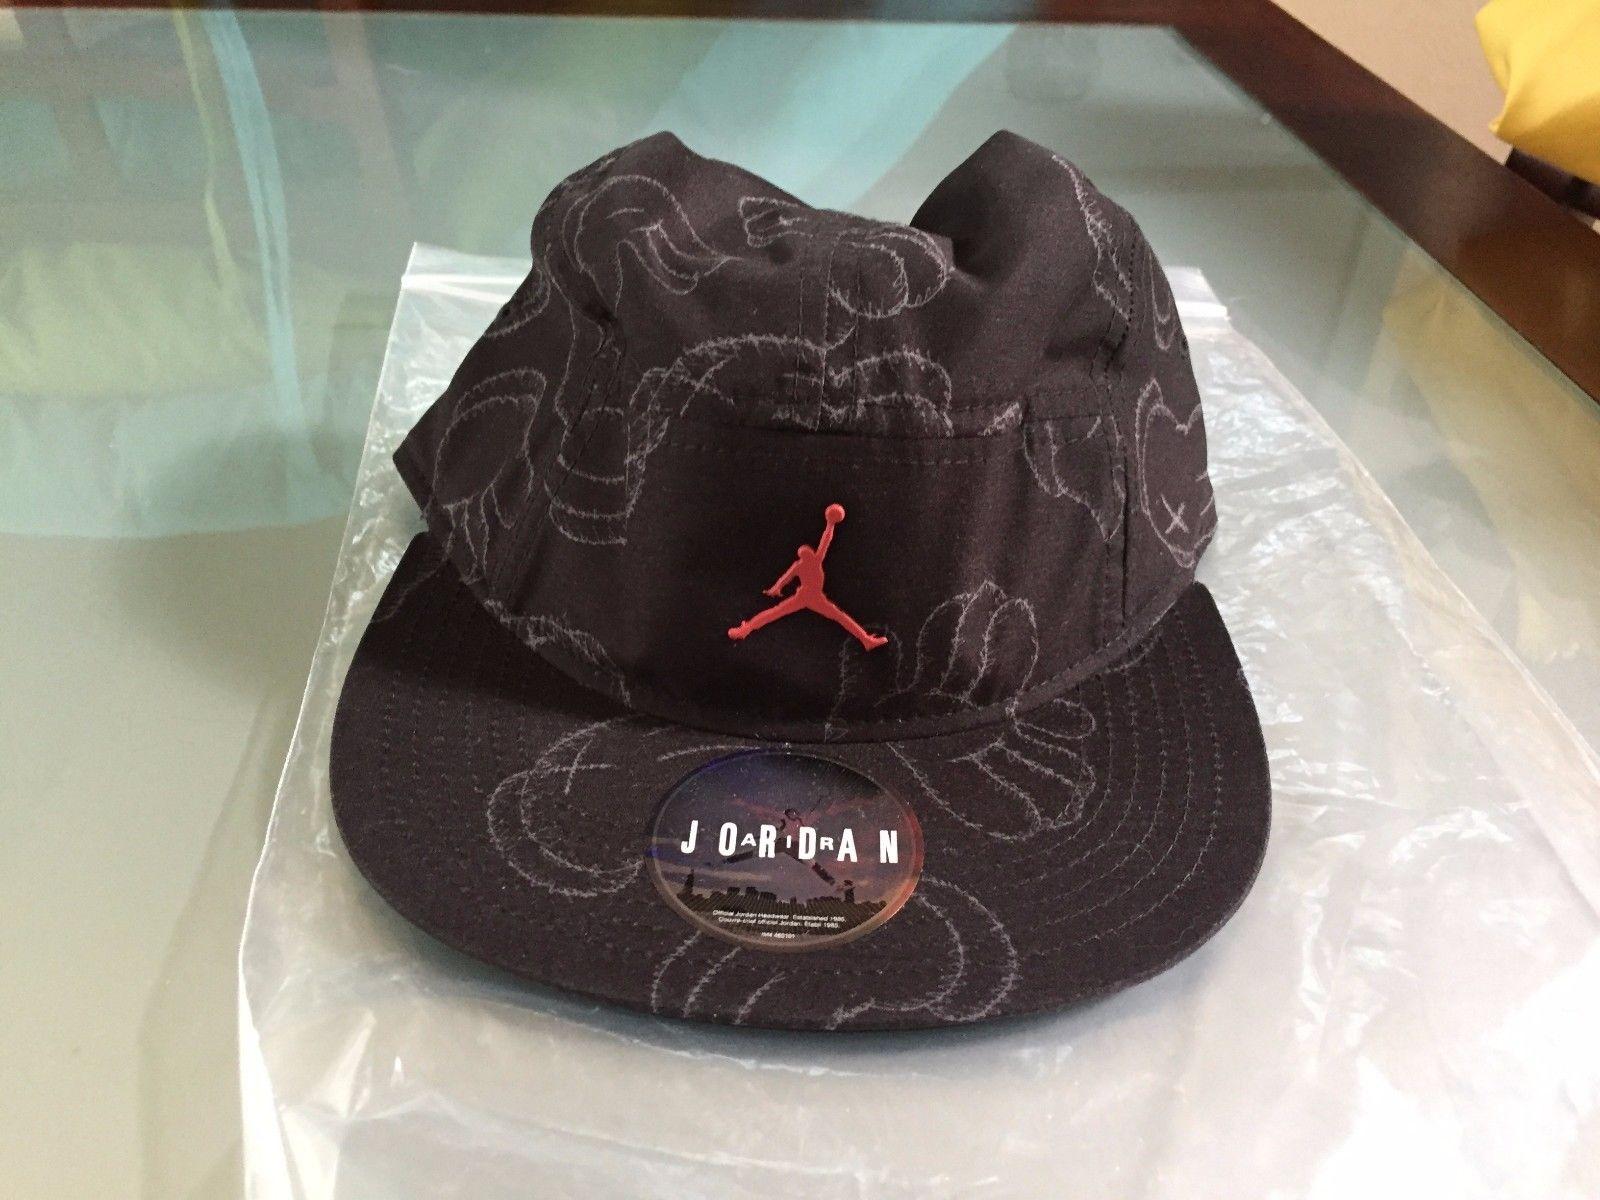 Kaws DS Kaws x Jordan 5 Panel OS Hat Size one size - Hats for Sale ... 8b6d76394b13